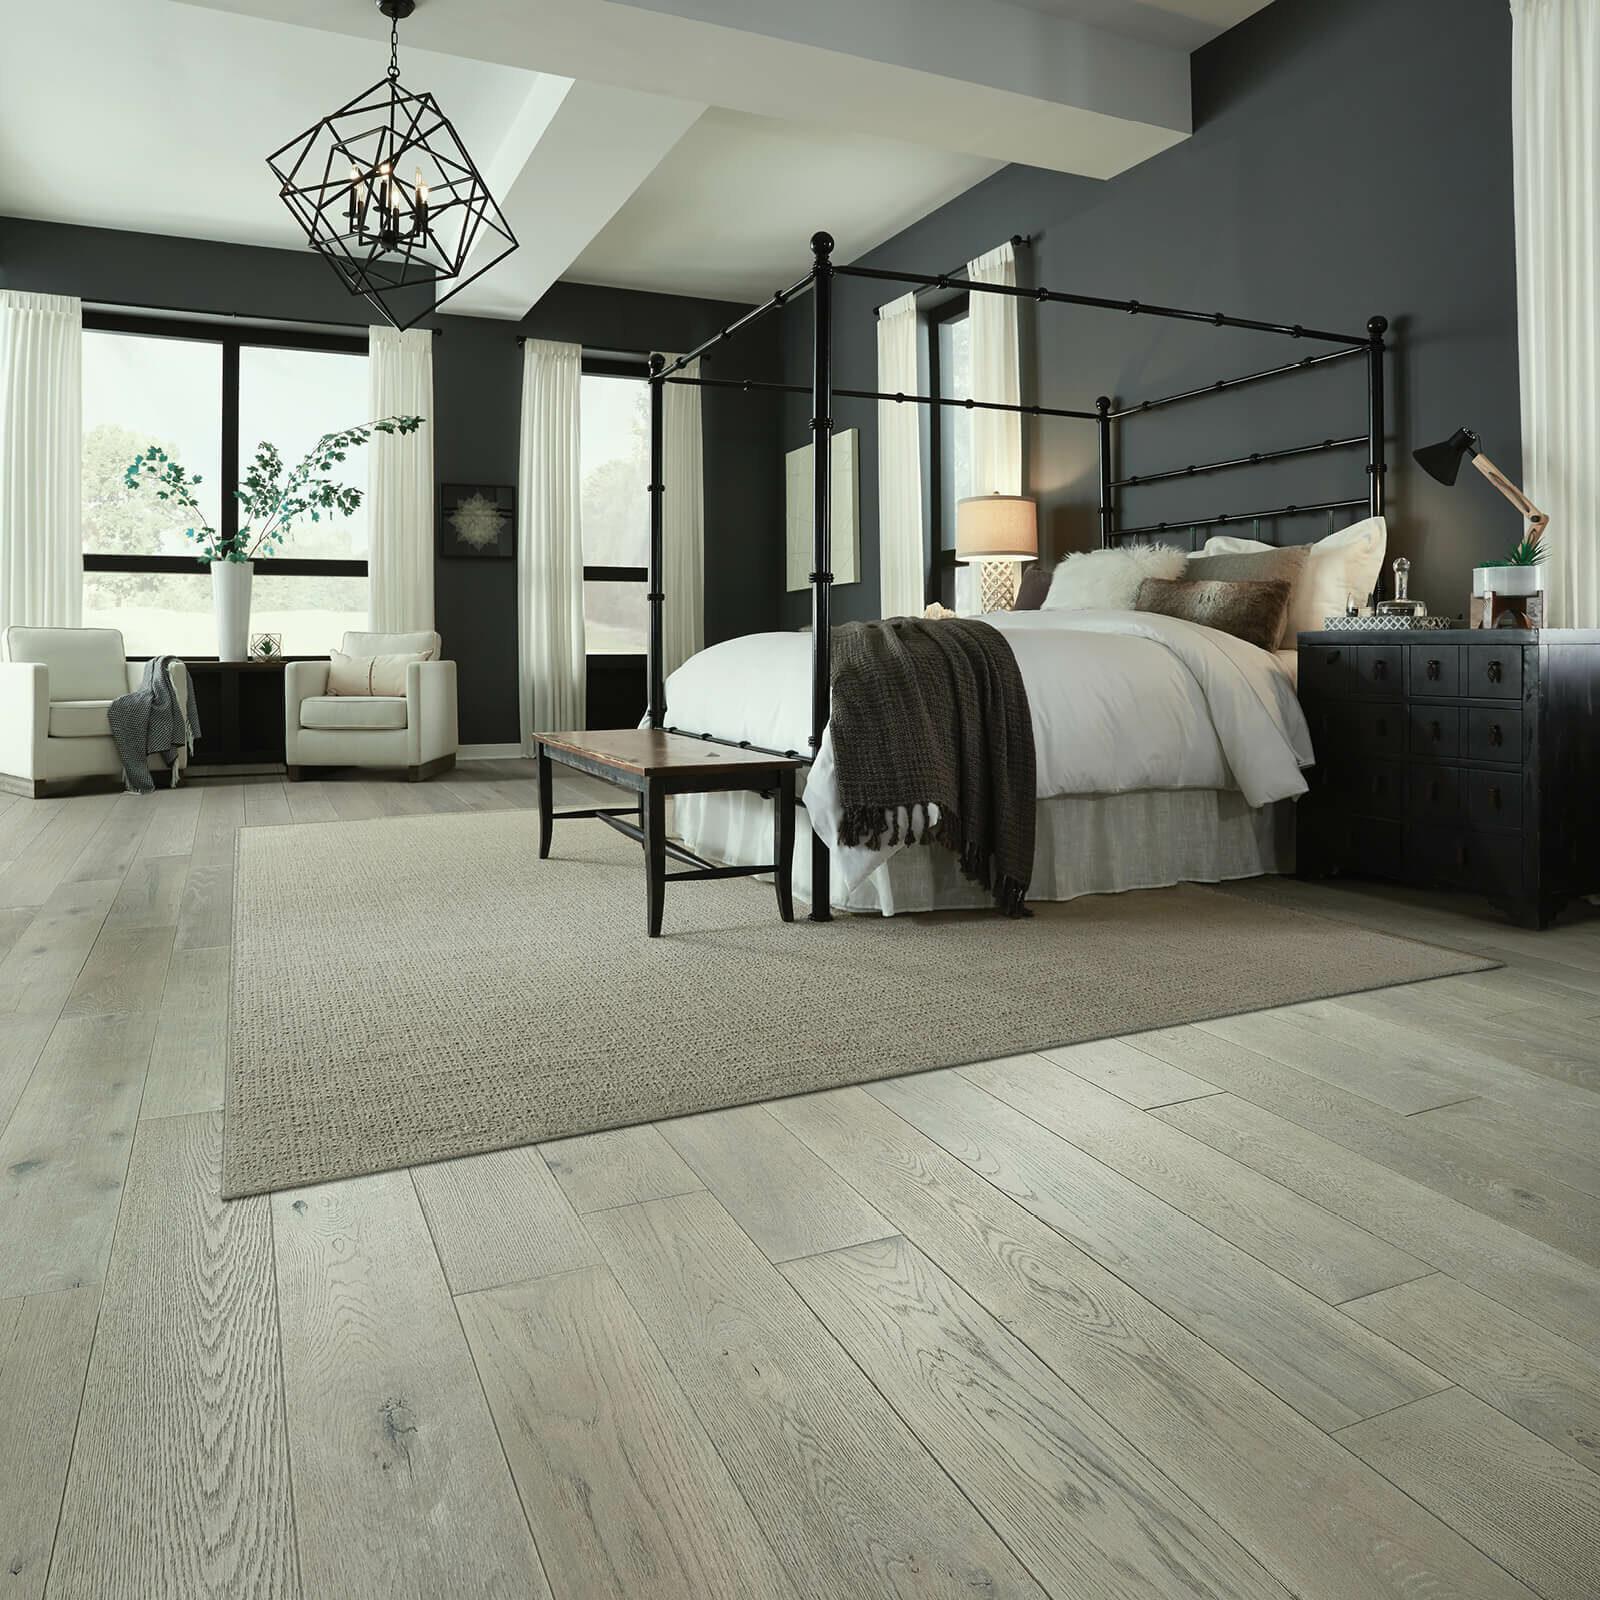 Kensington Pembridge Custom Rug | Masters And Petersens Flooring